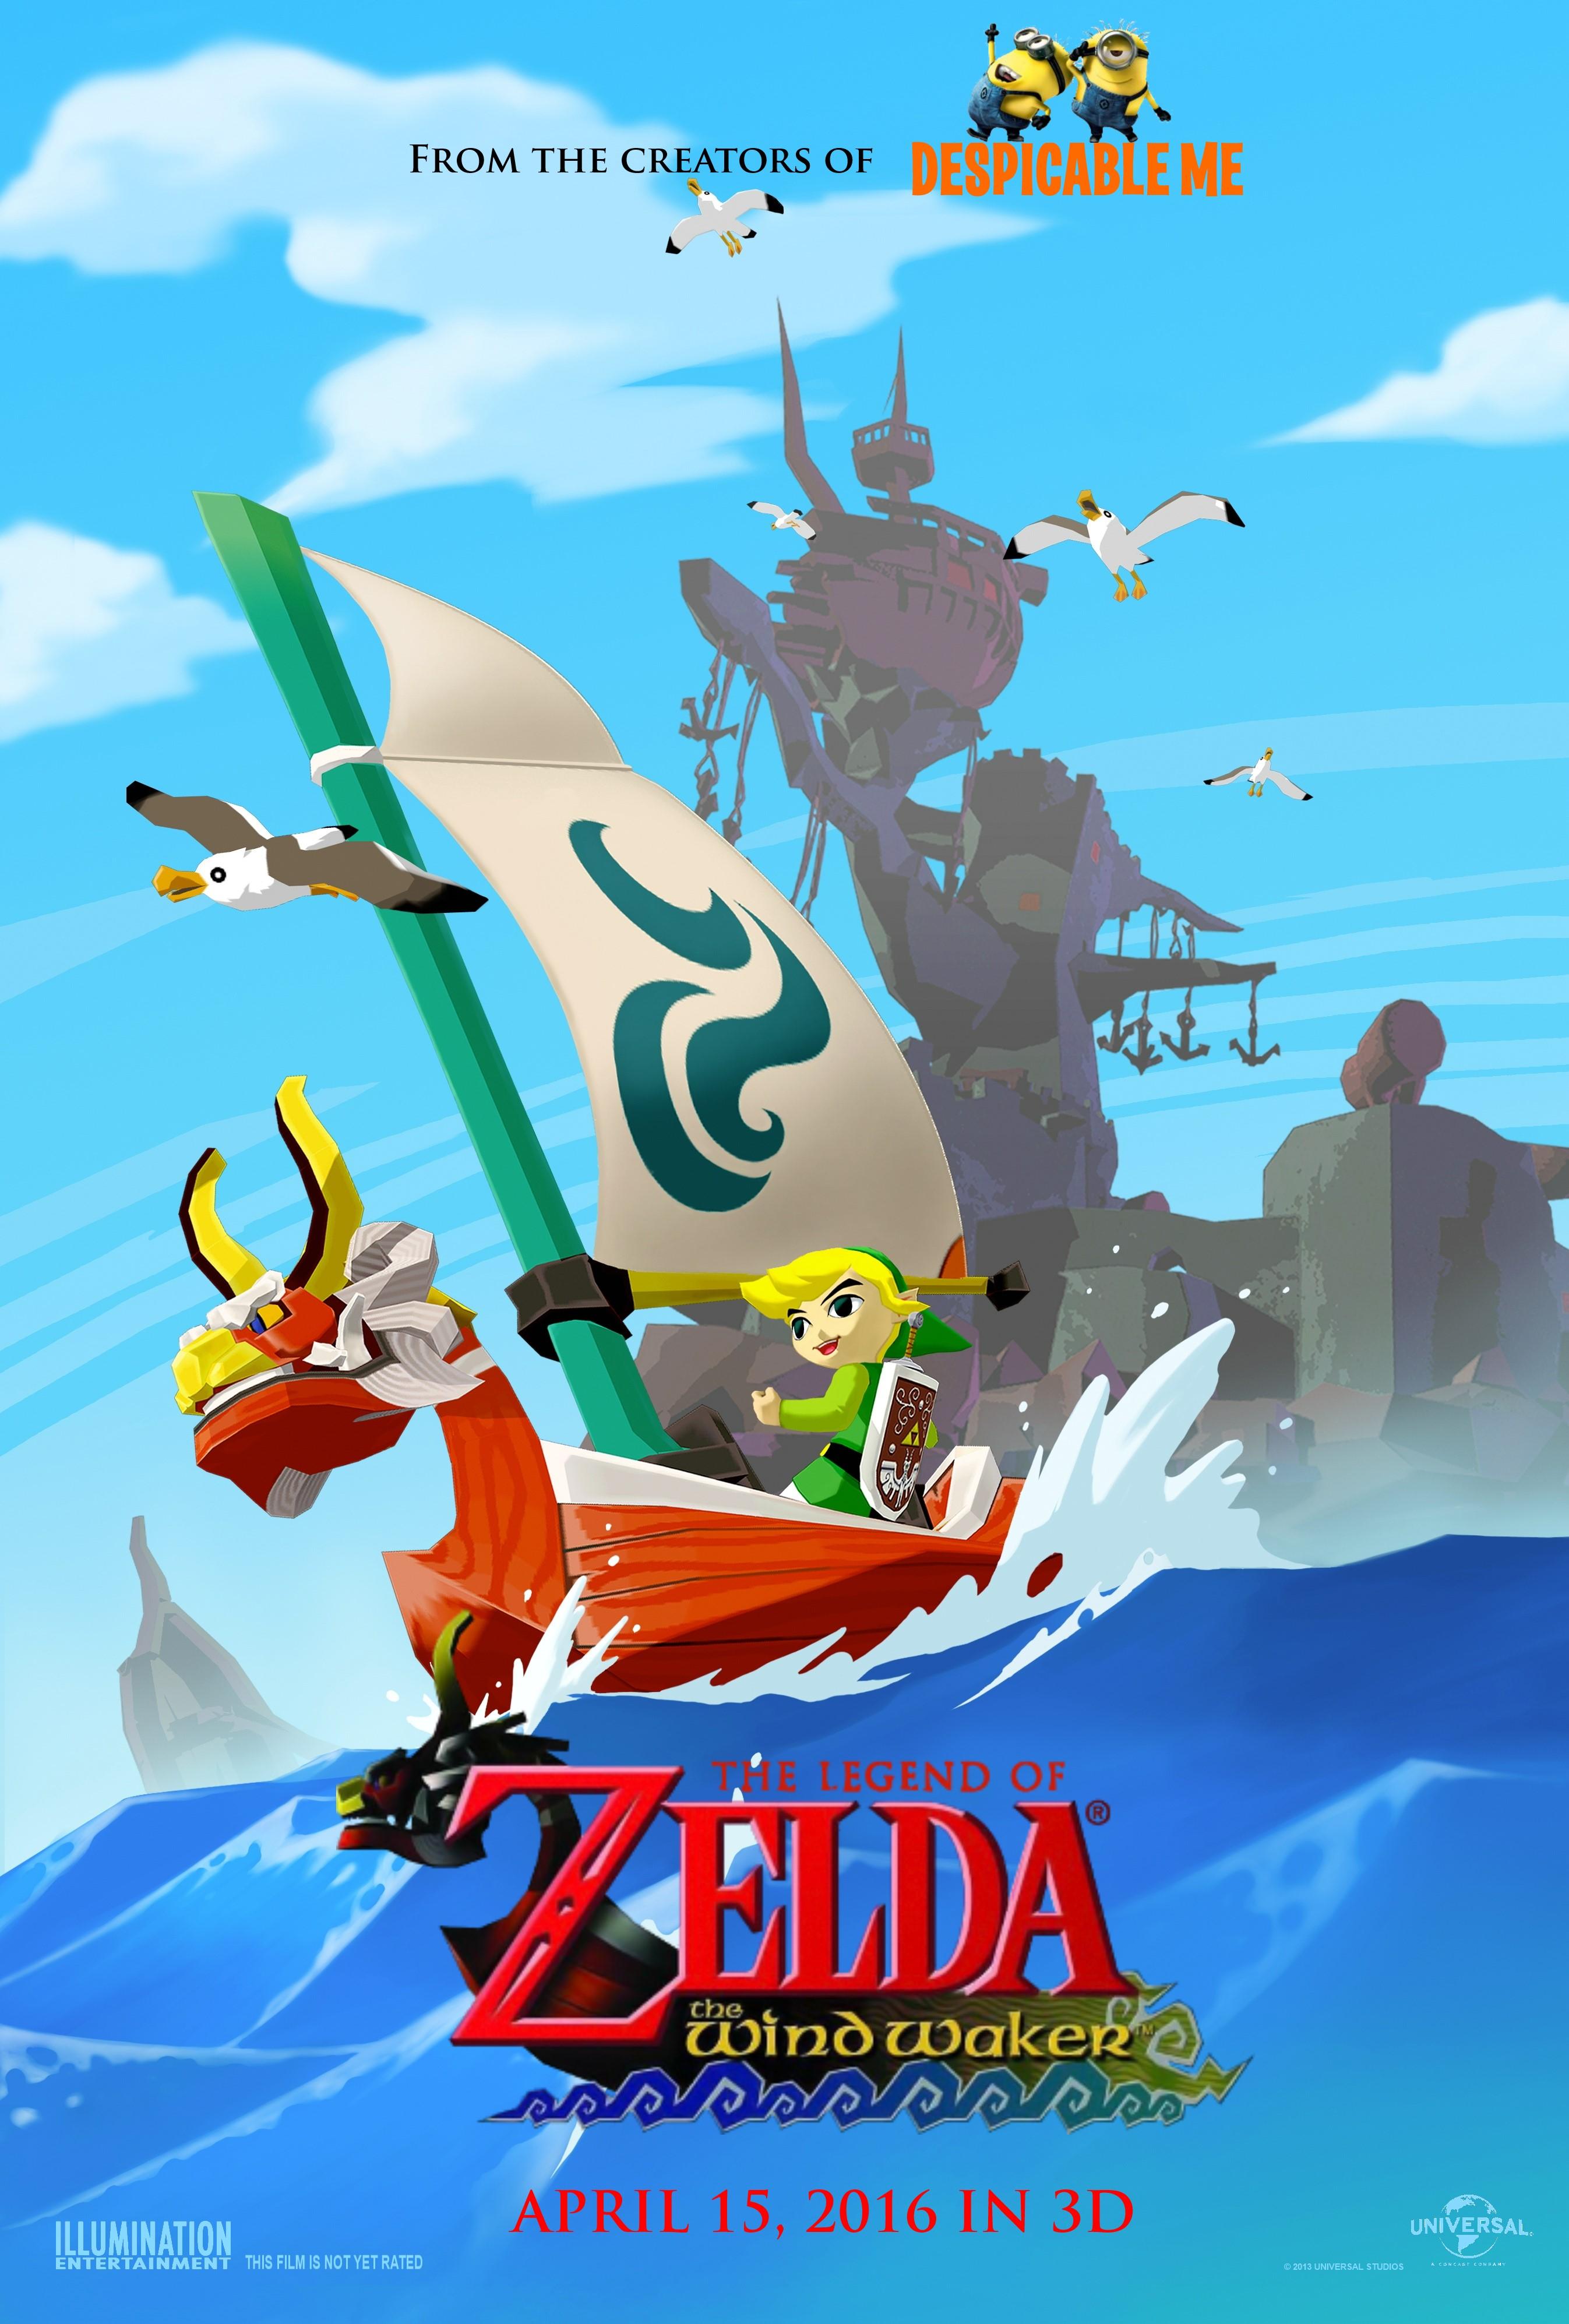 Legend Of Zelda Wind Waker Poster Poster  The Legend of Zelda